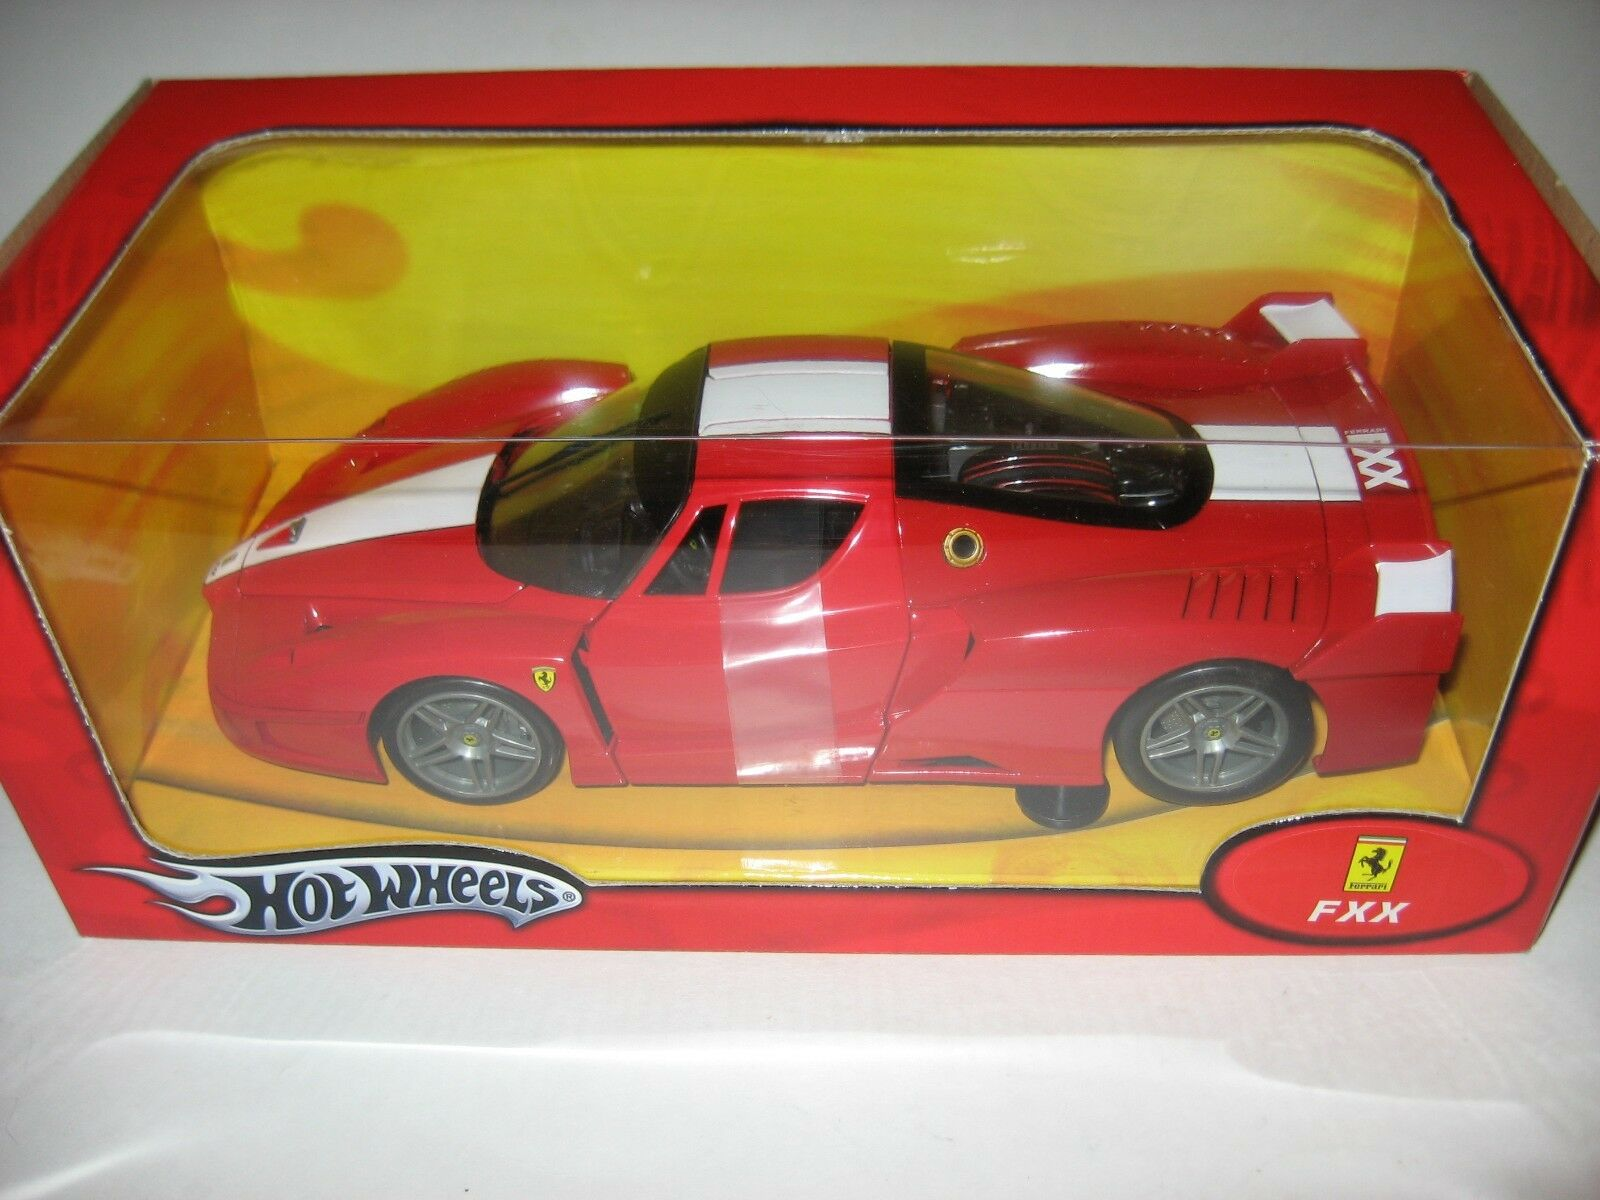 2005 Ferrari FXX Súper Súper Súper Coche Hot Wheels réplica diecast escala 1 18 Modelo De Coche Nuevo 1c24c7